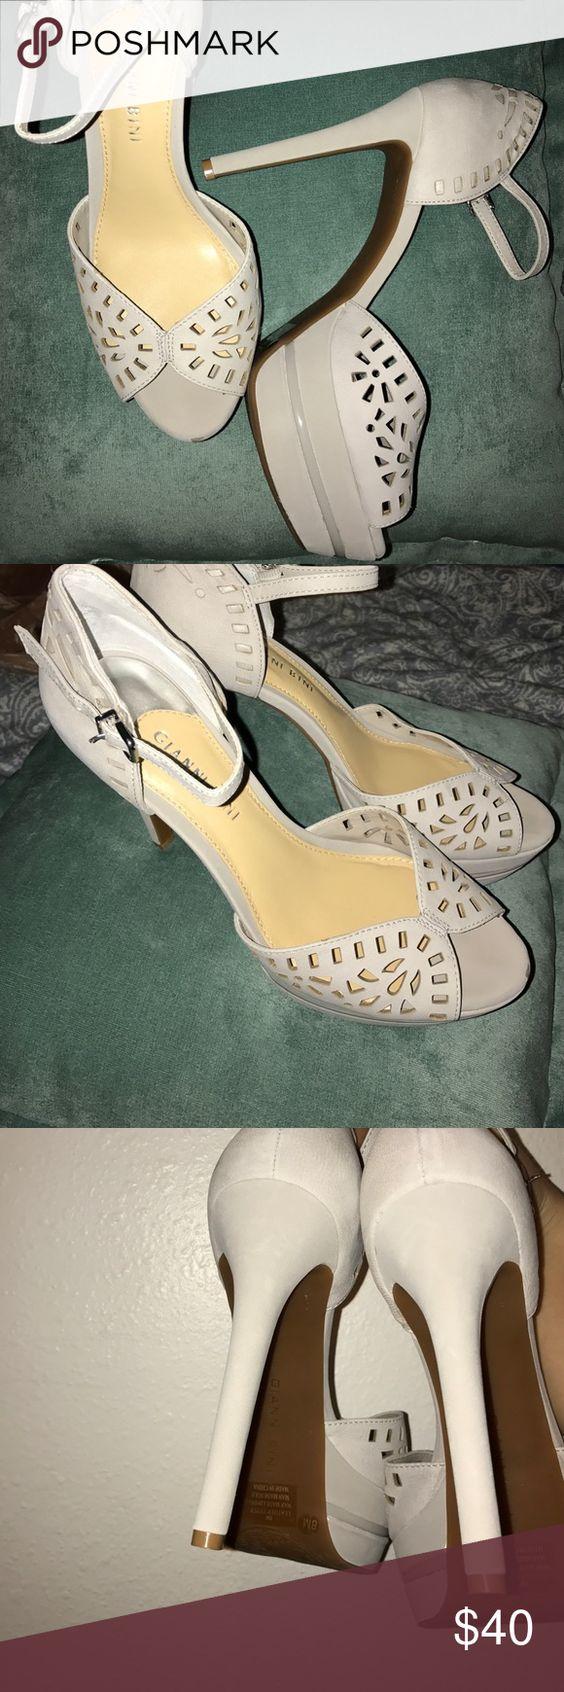 Giani Bini Heels. Giani Bini heels in silver New Never Worn Giani Bini Shoes Heels